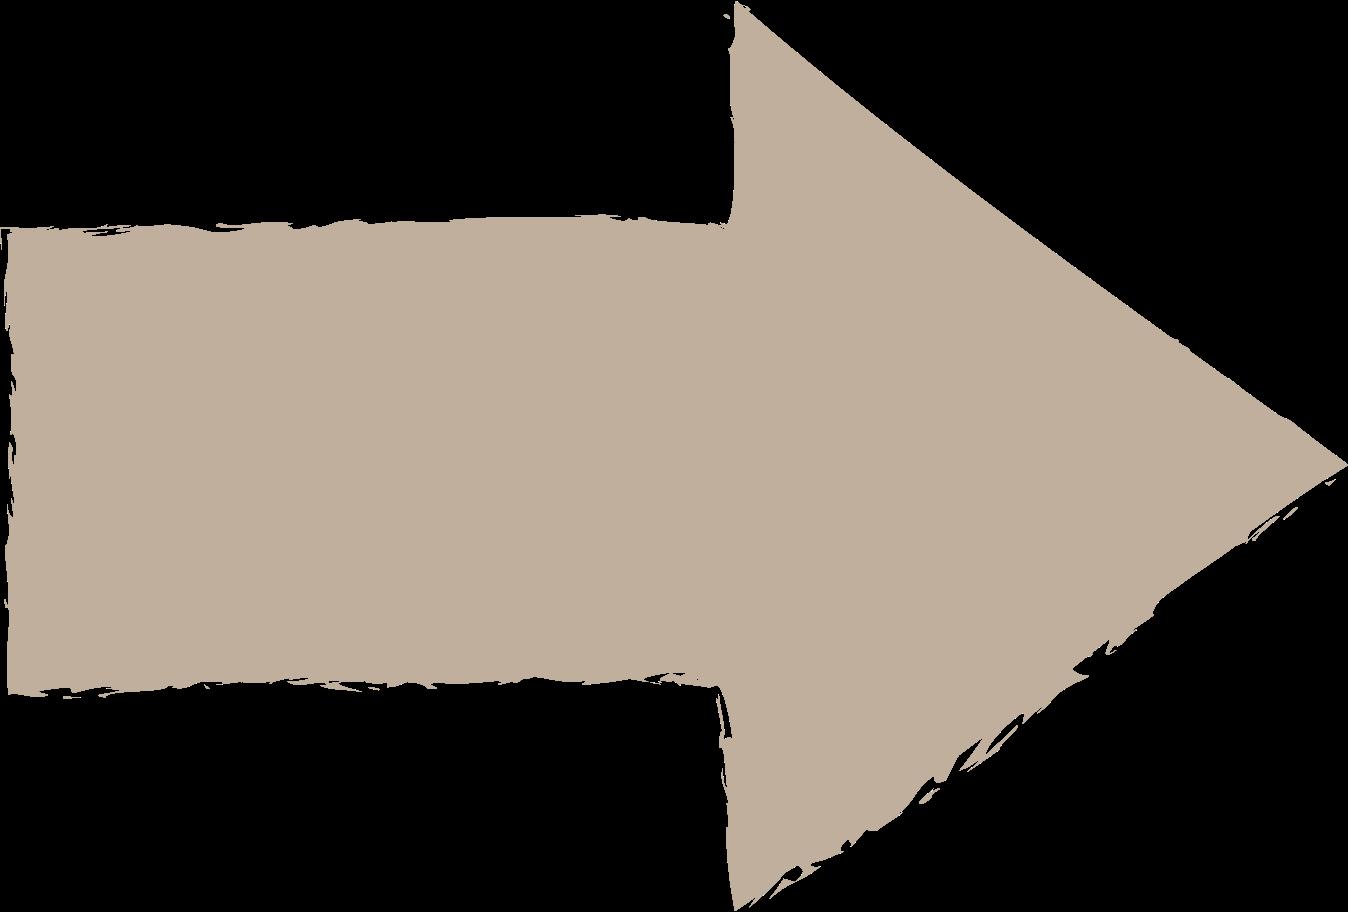 arrow-light-grey Clipart illustration in PNG, SVG